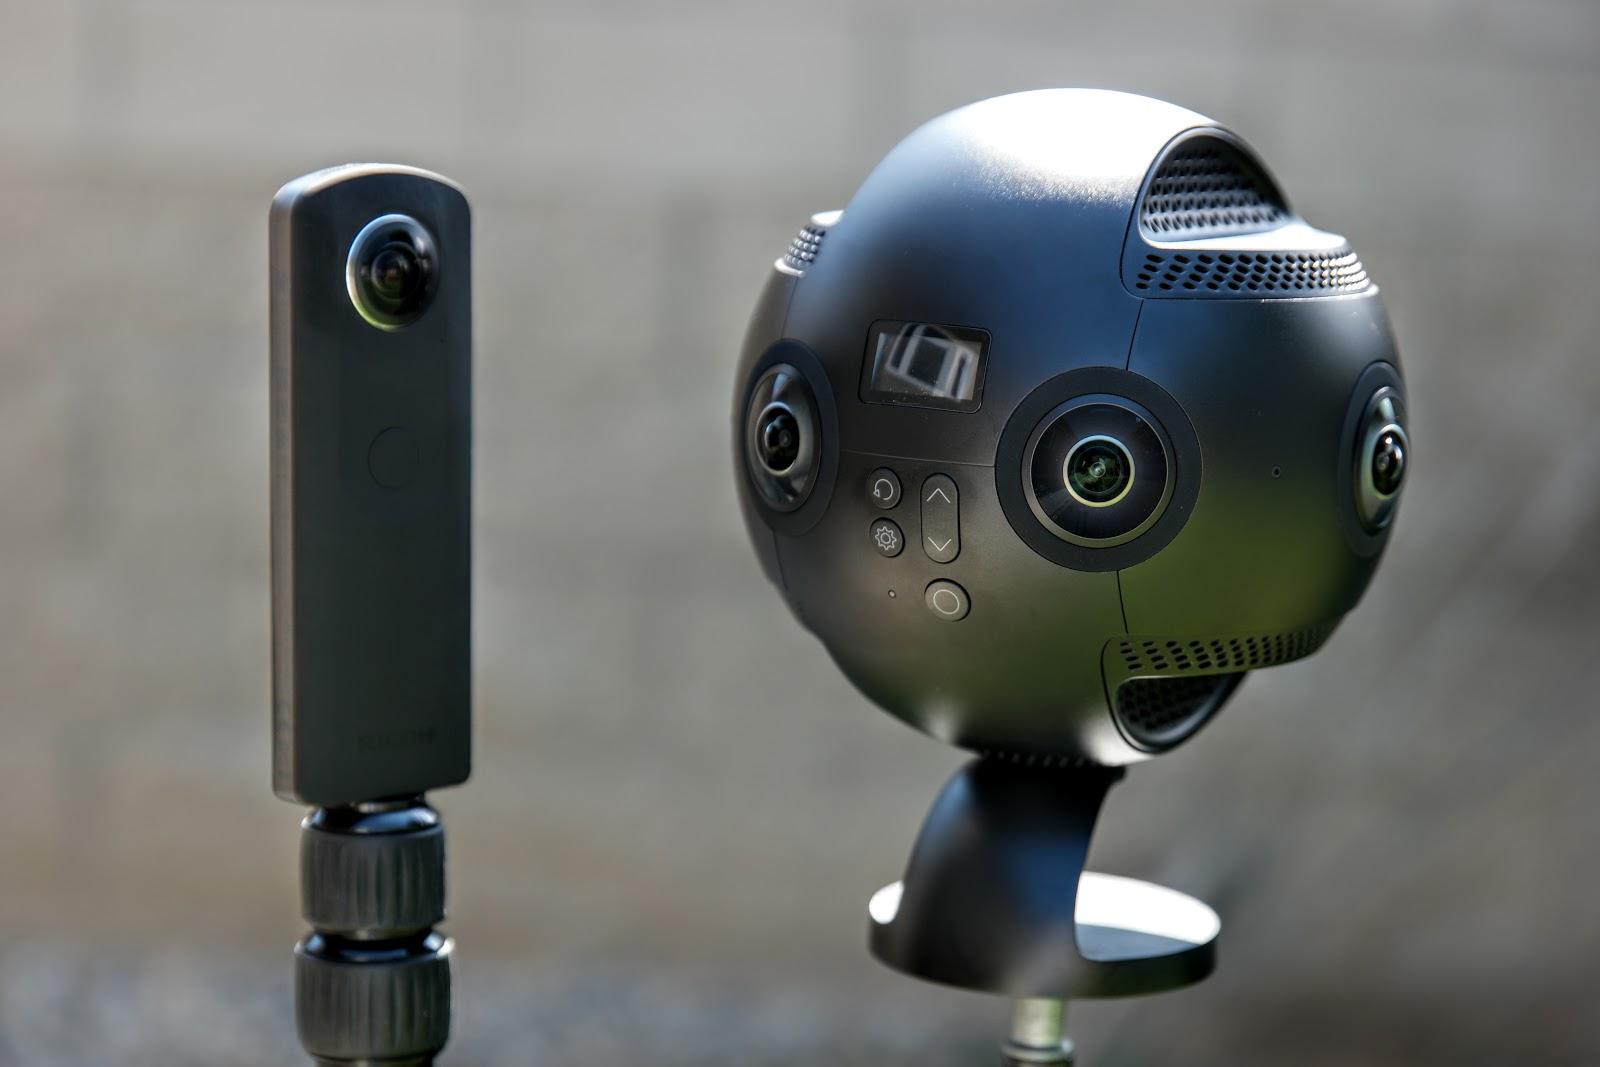 Видео Insta360 Pro против фото Ricoh Theta S